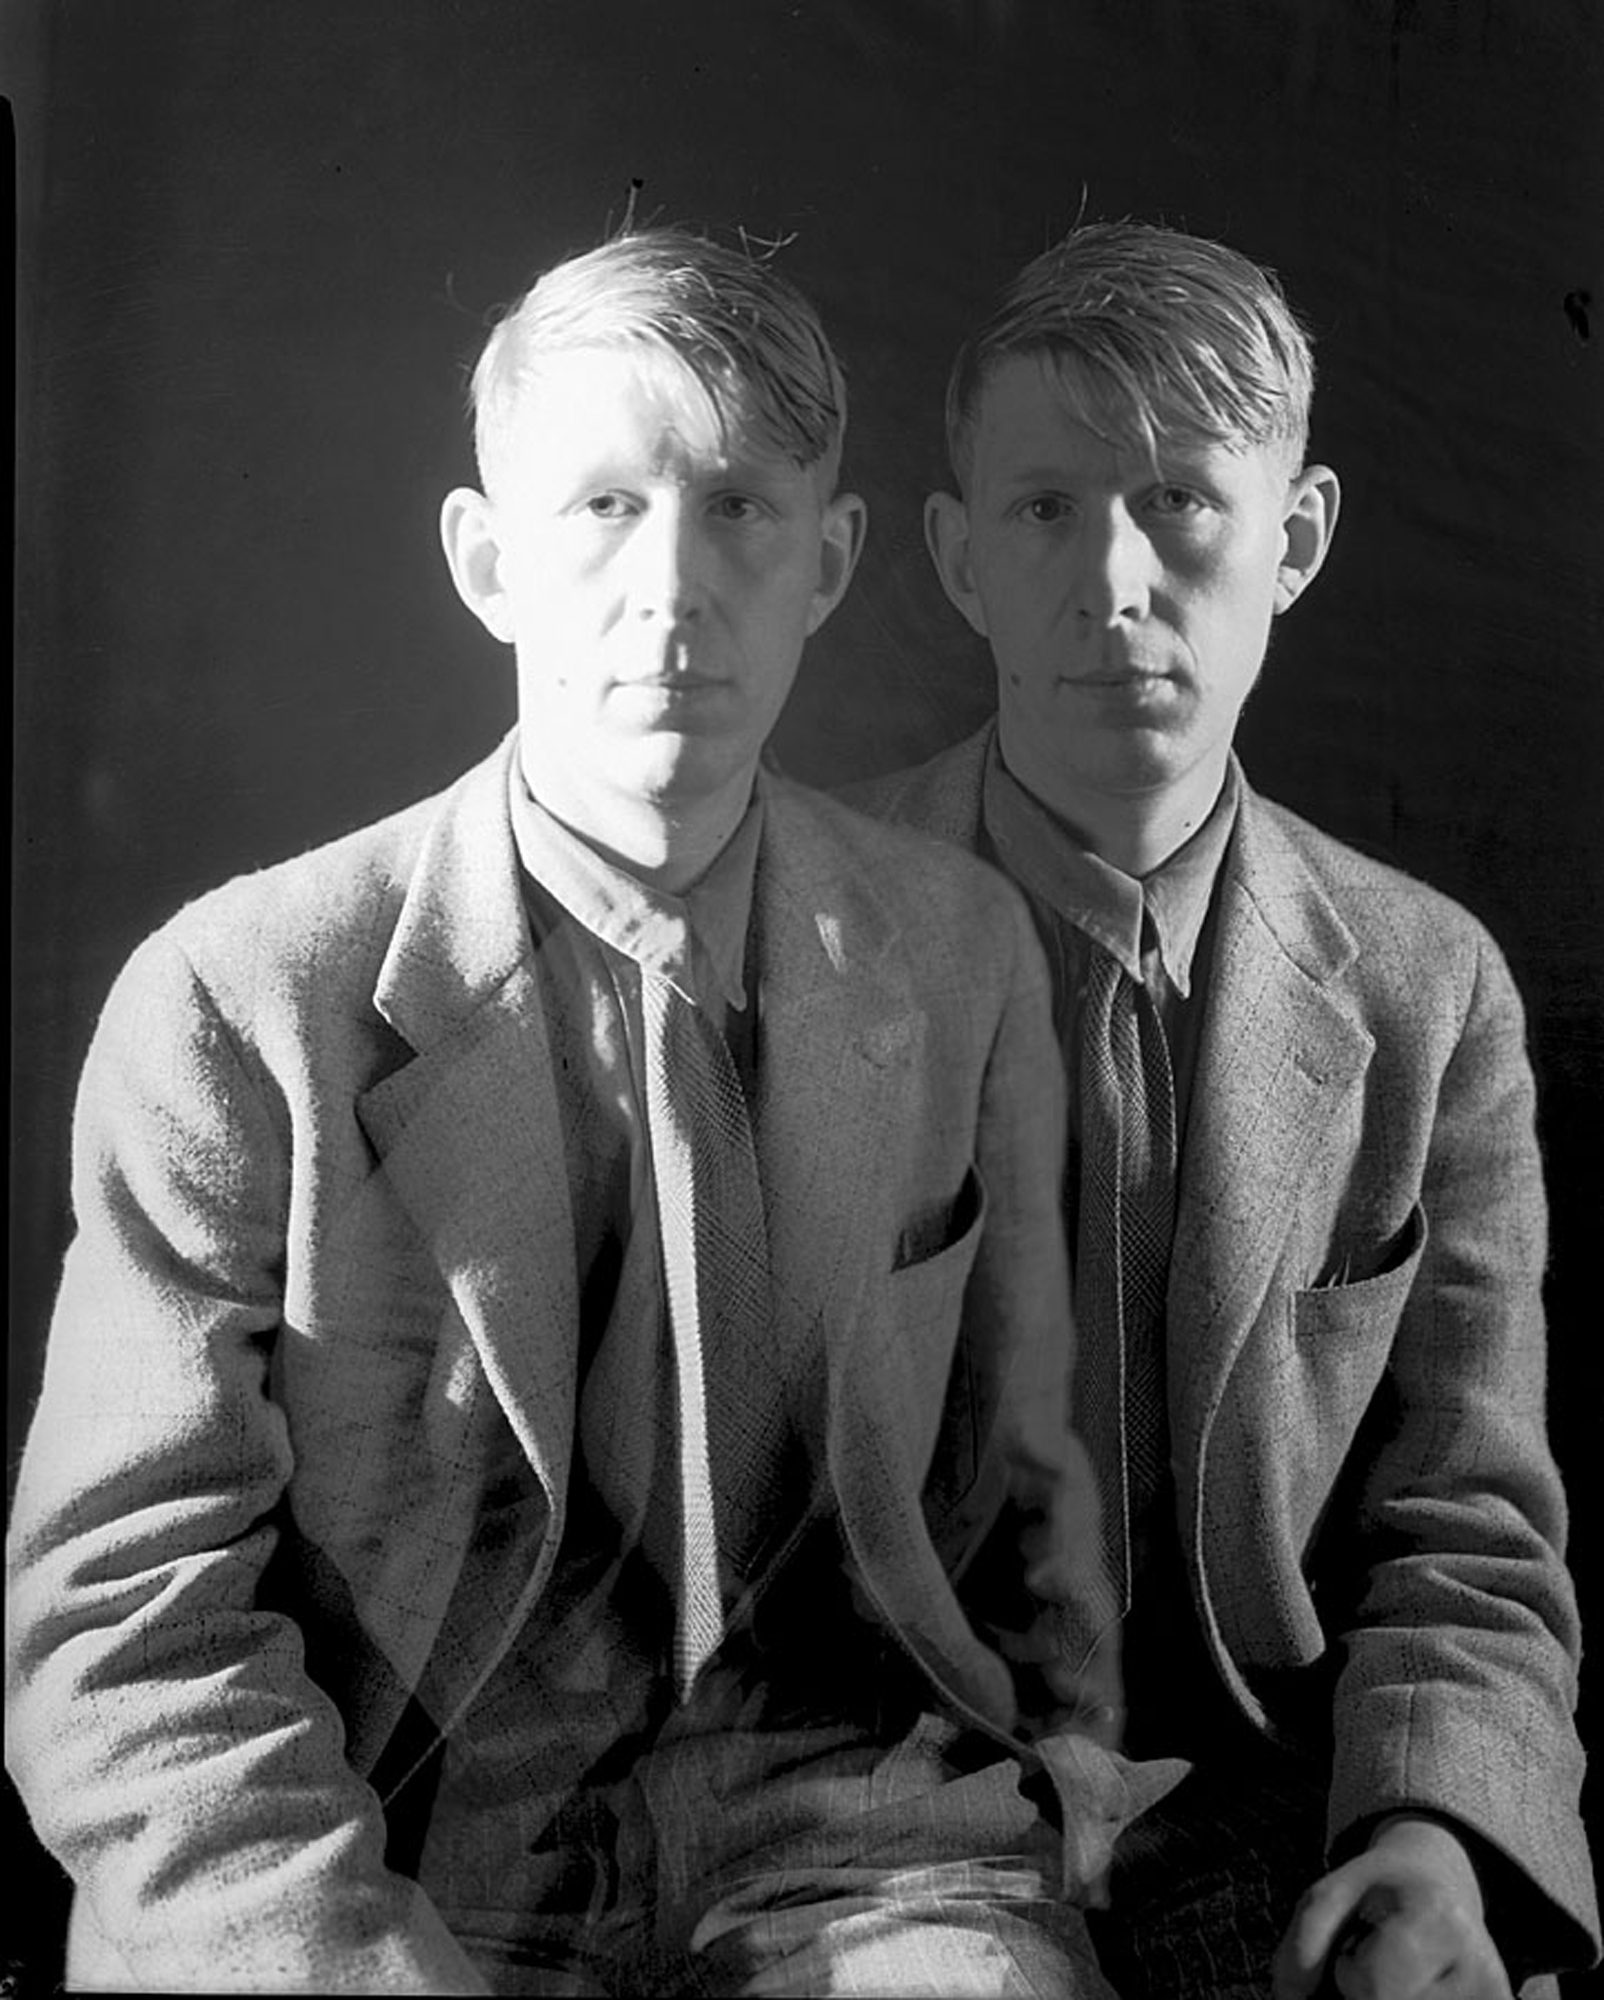 W H Auden by Cecil Beaton